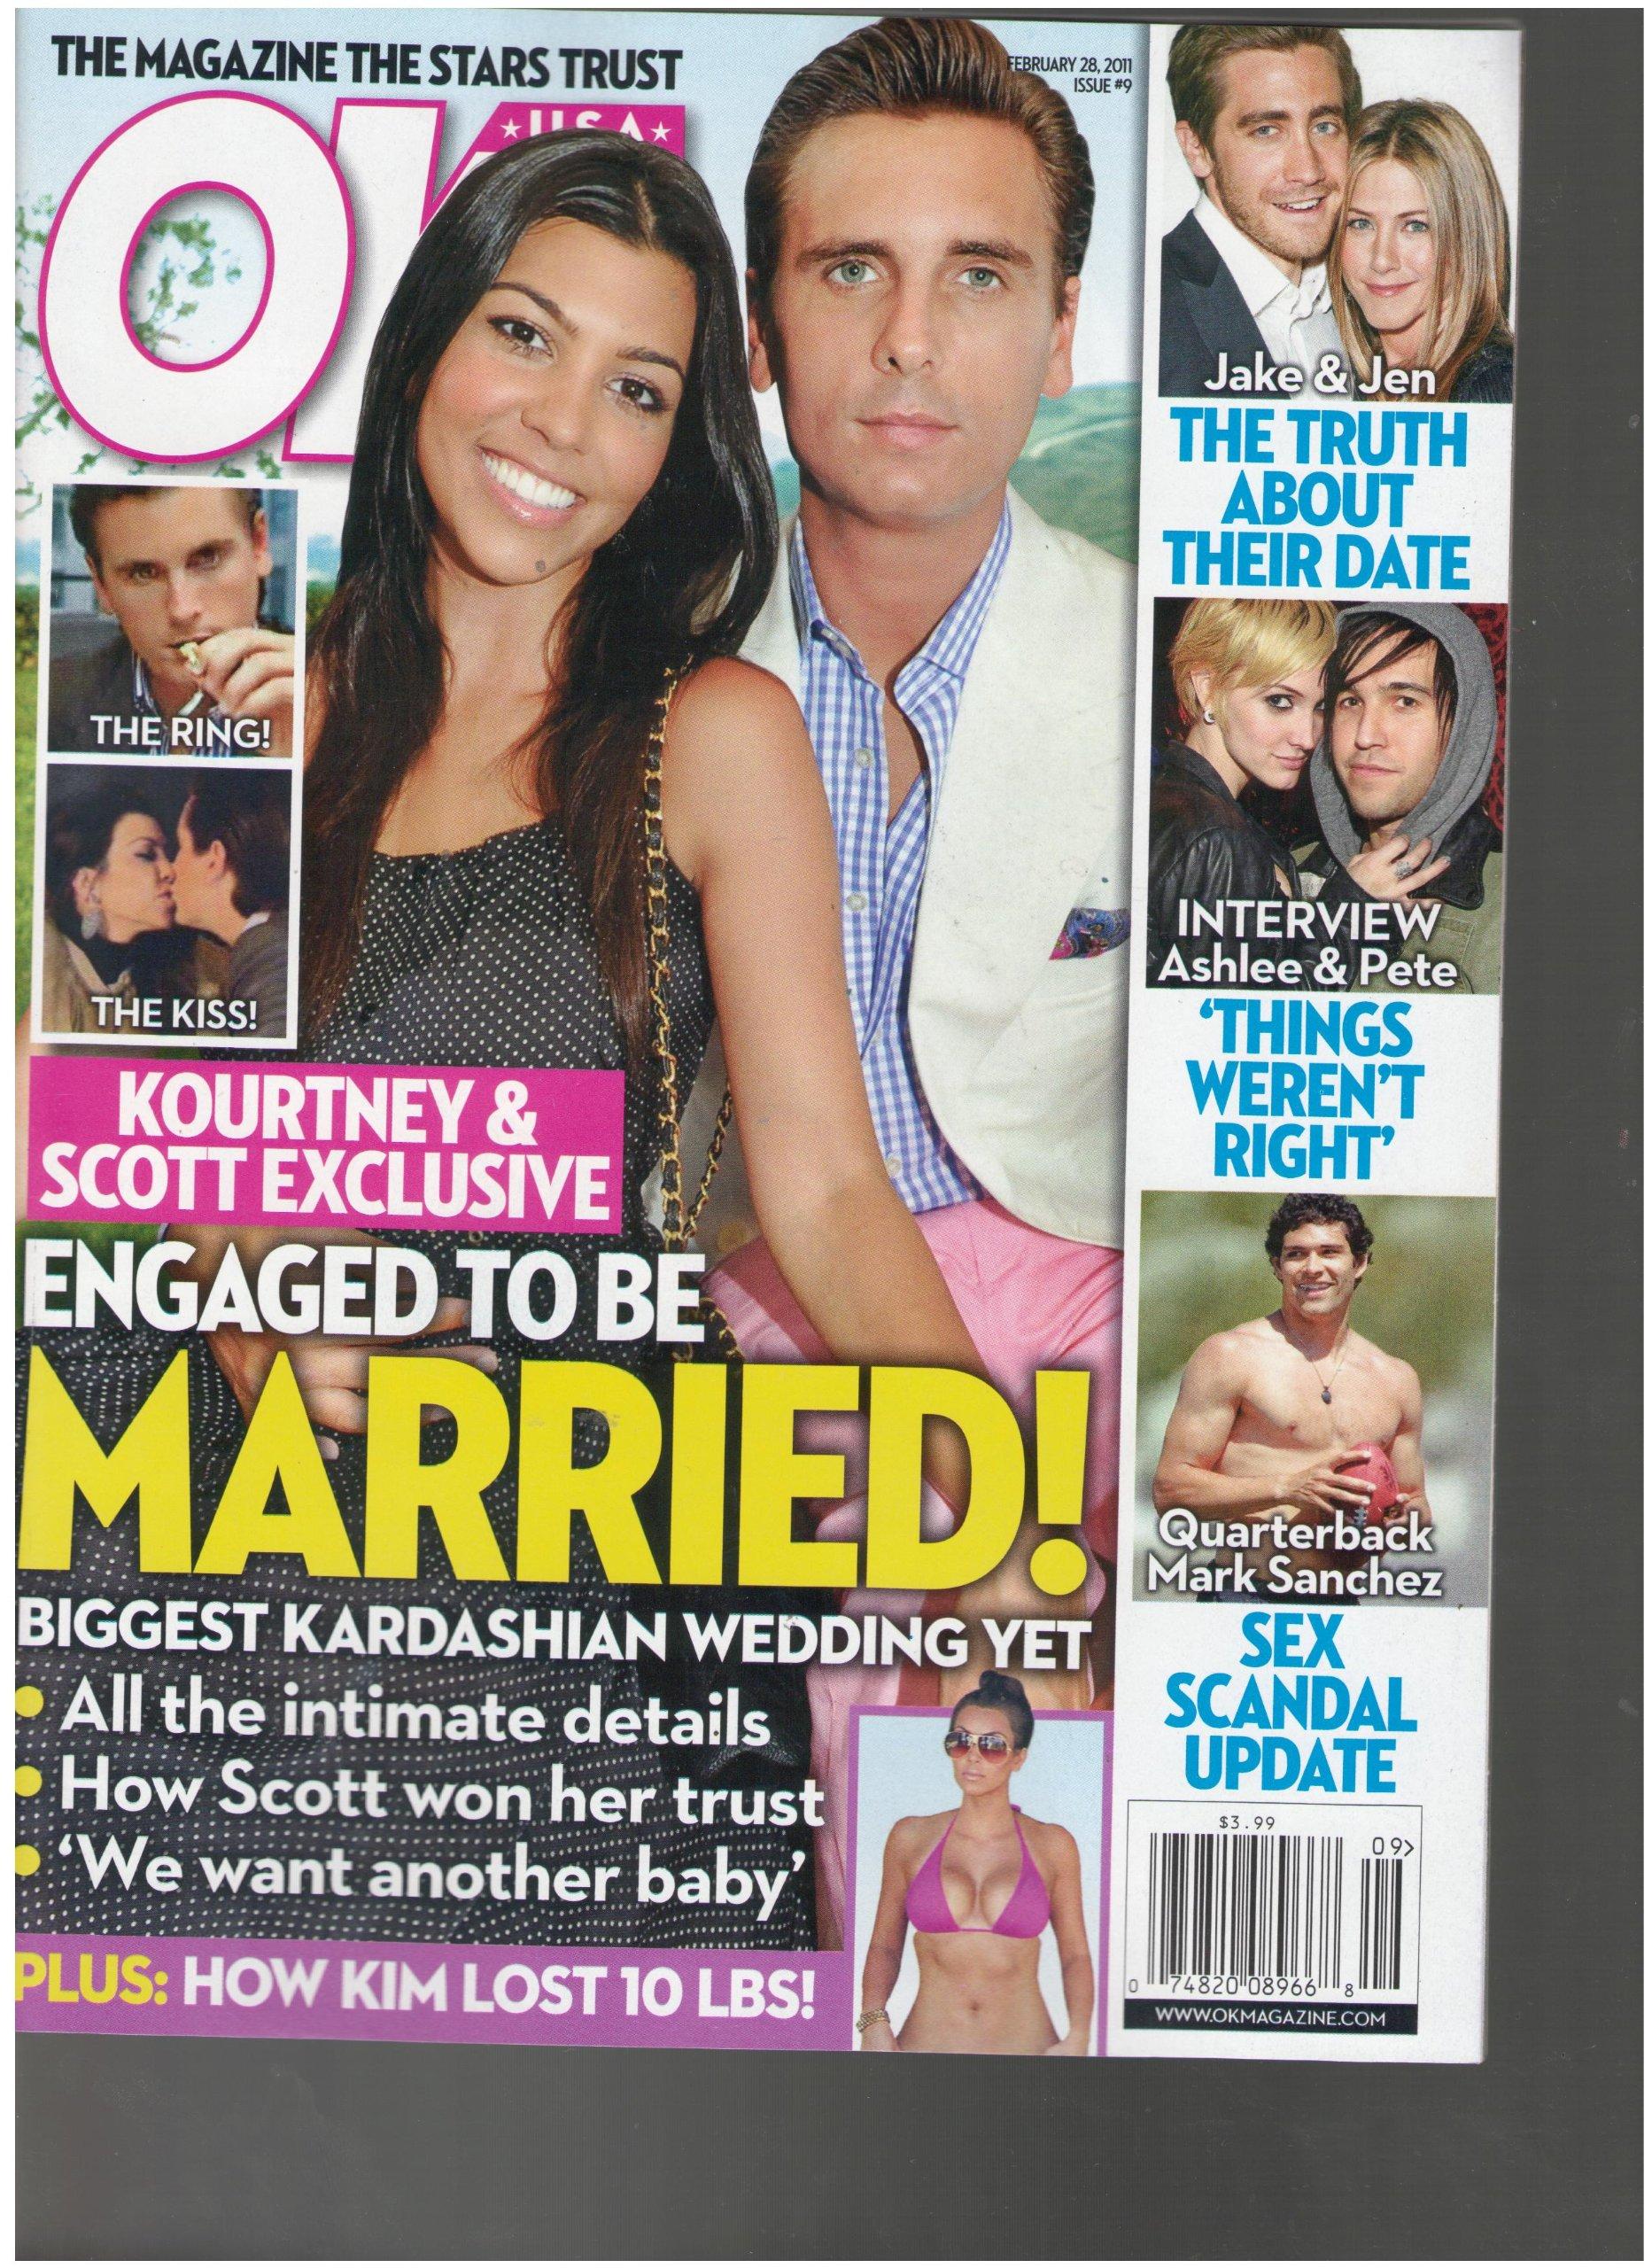 Ok Weekly Magazine (Kourtney & Scott Engaged to be married, February 28 2011) PDF